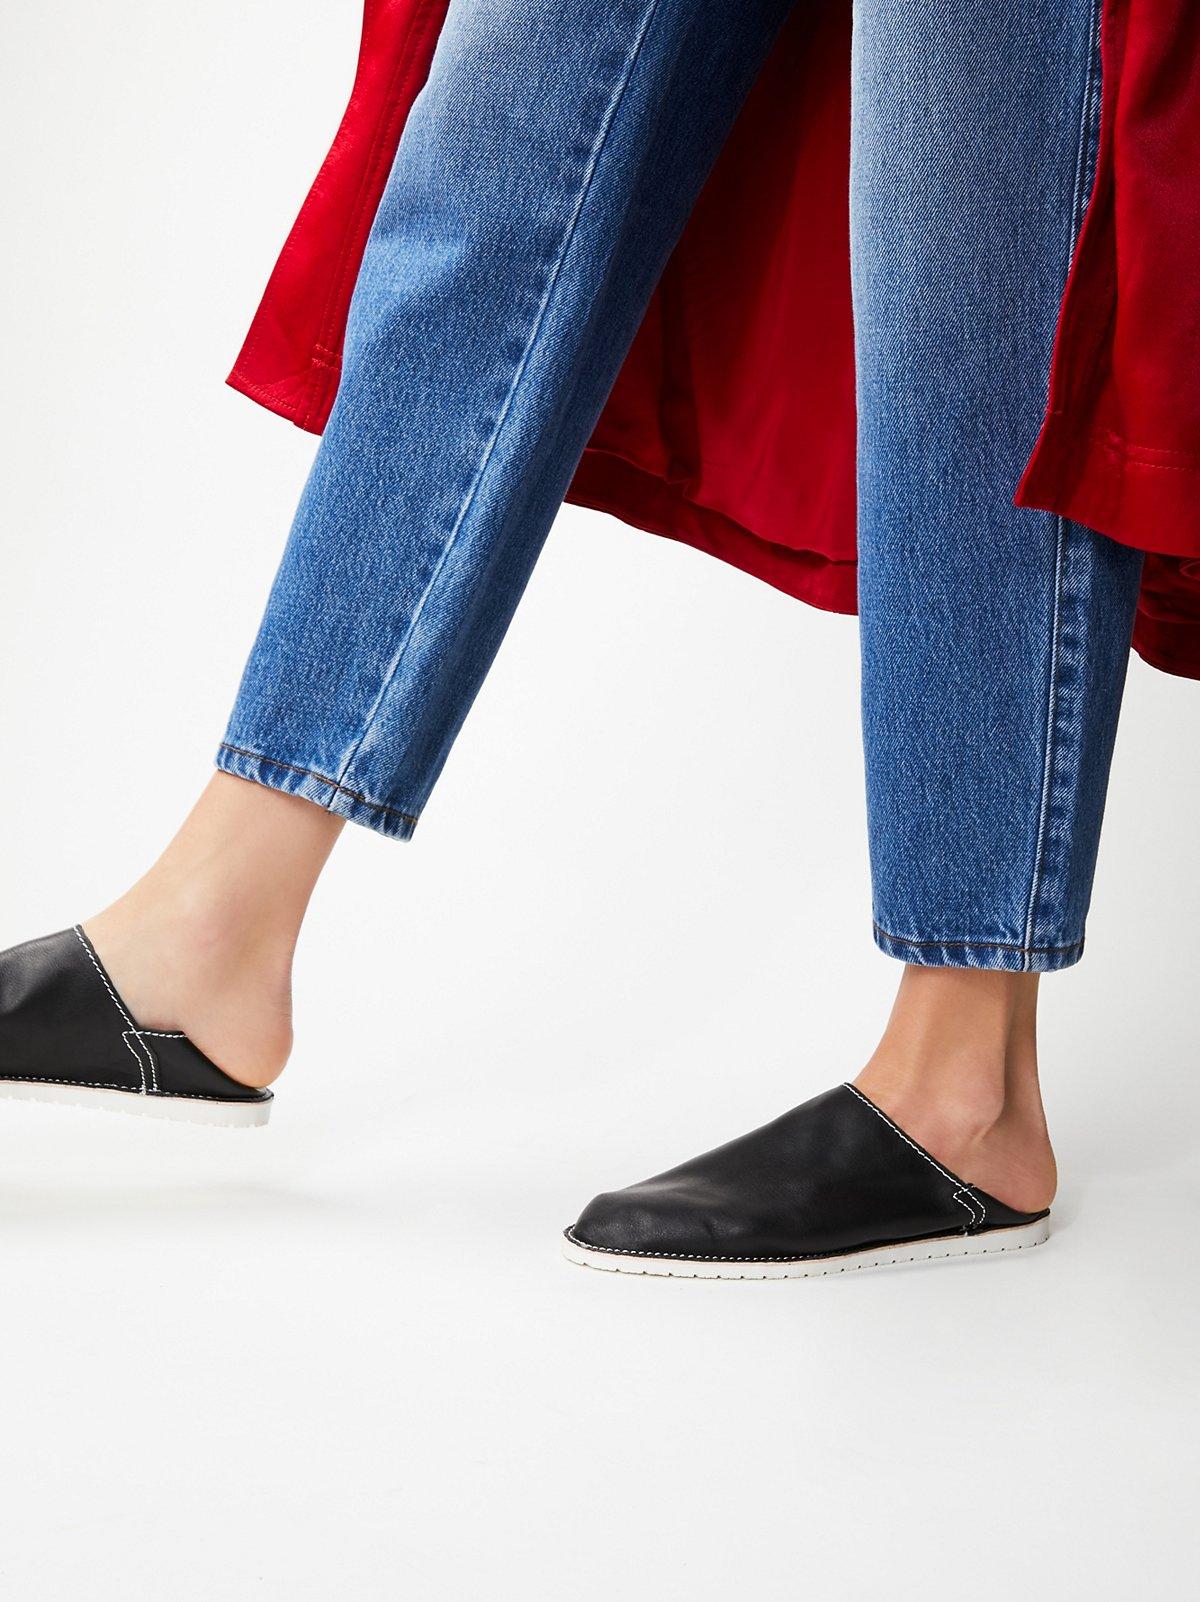 Weekdays Leather Flat